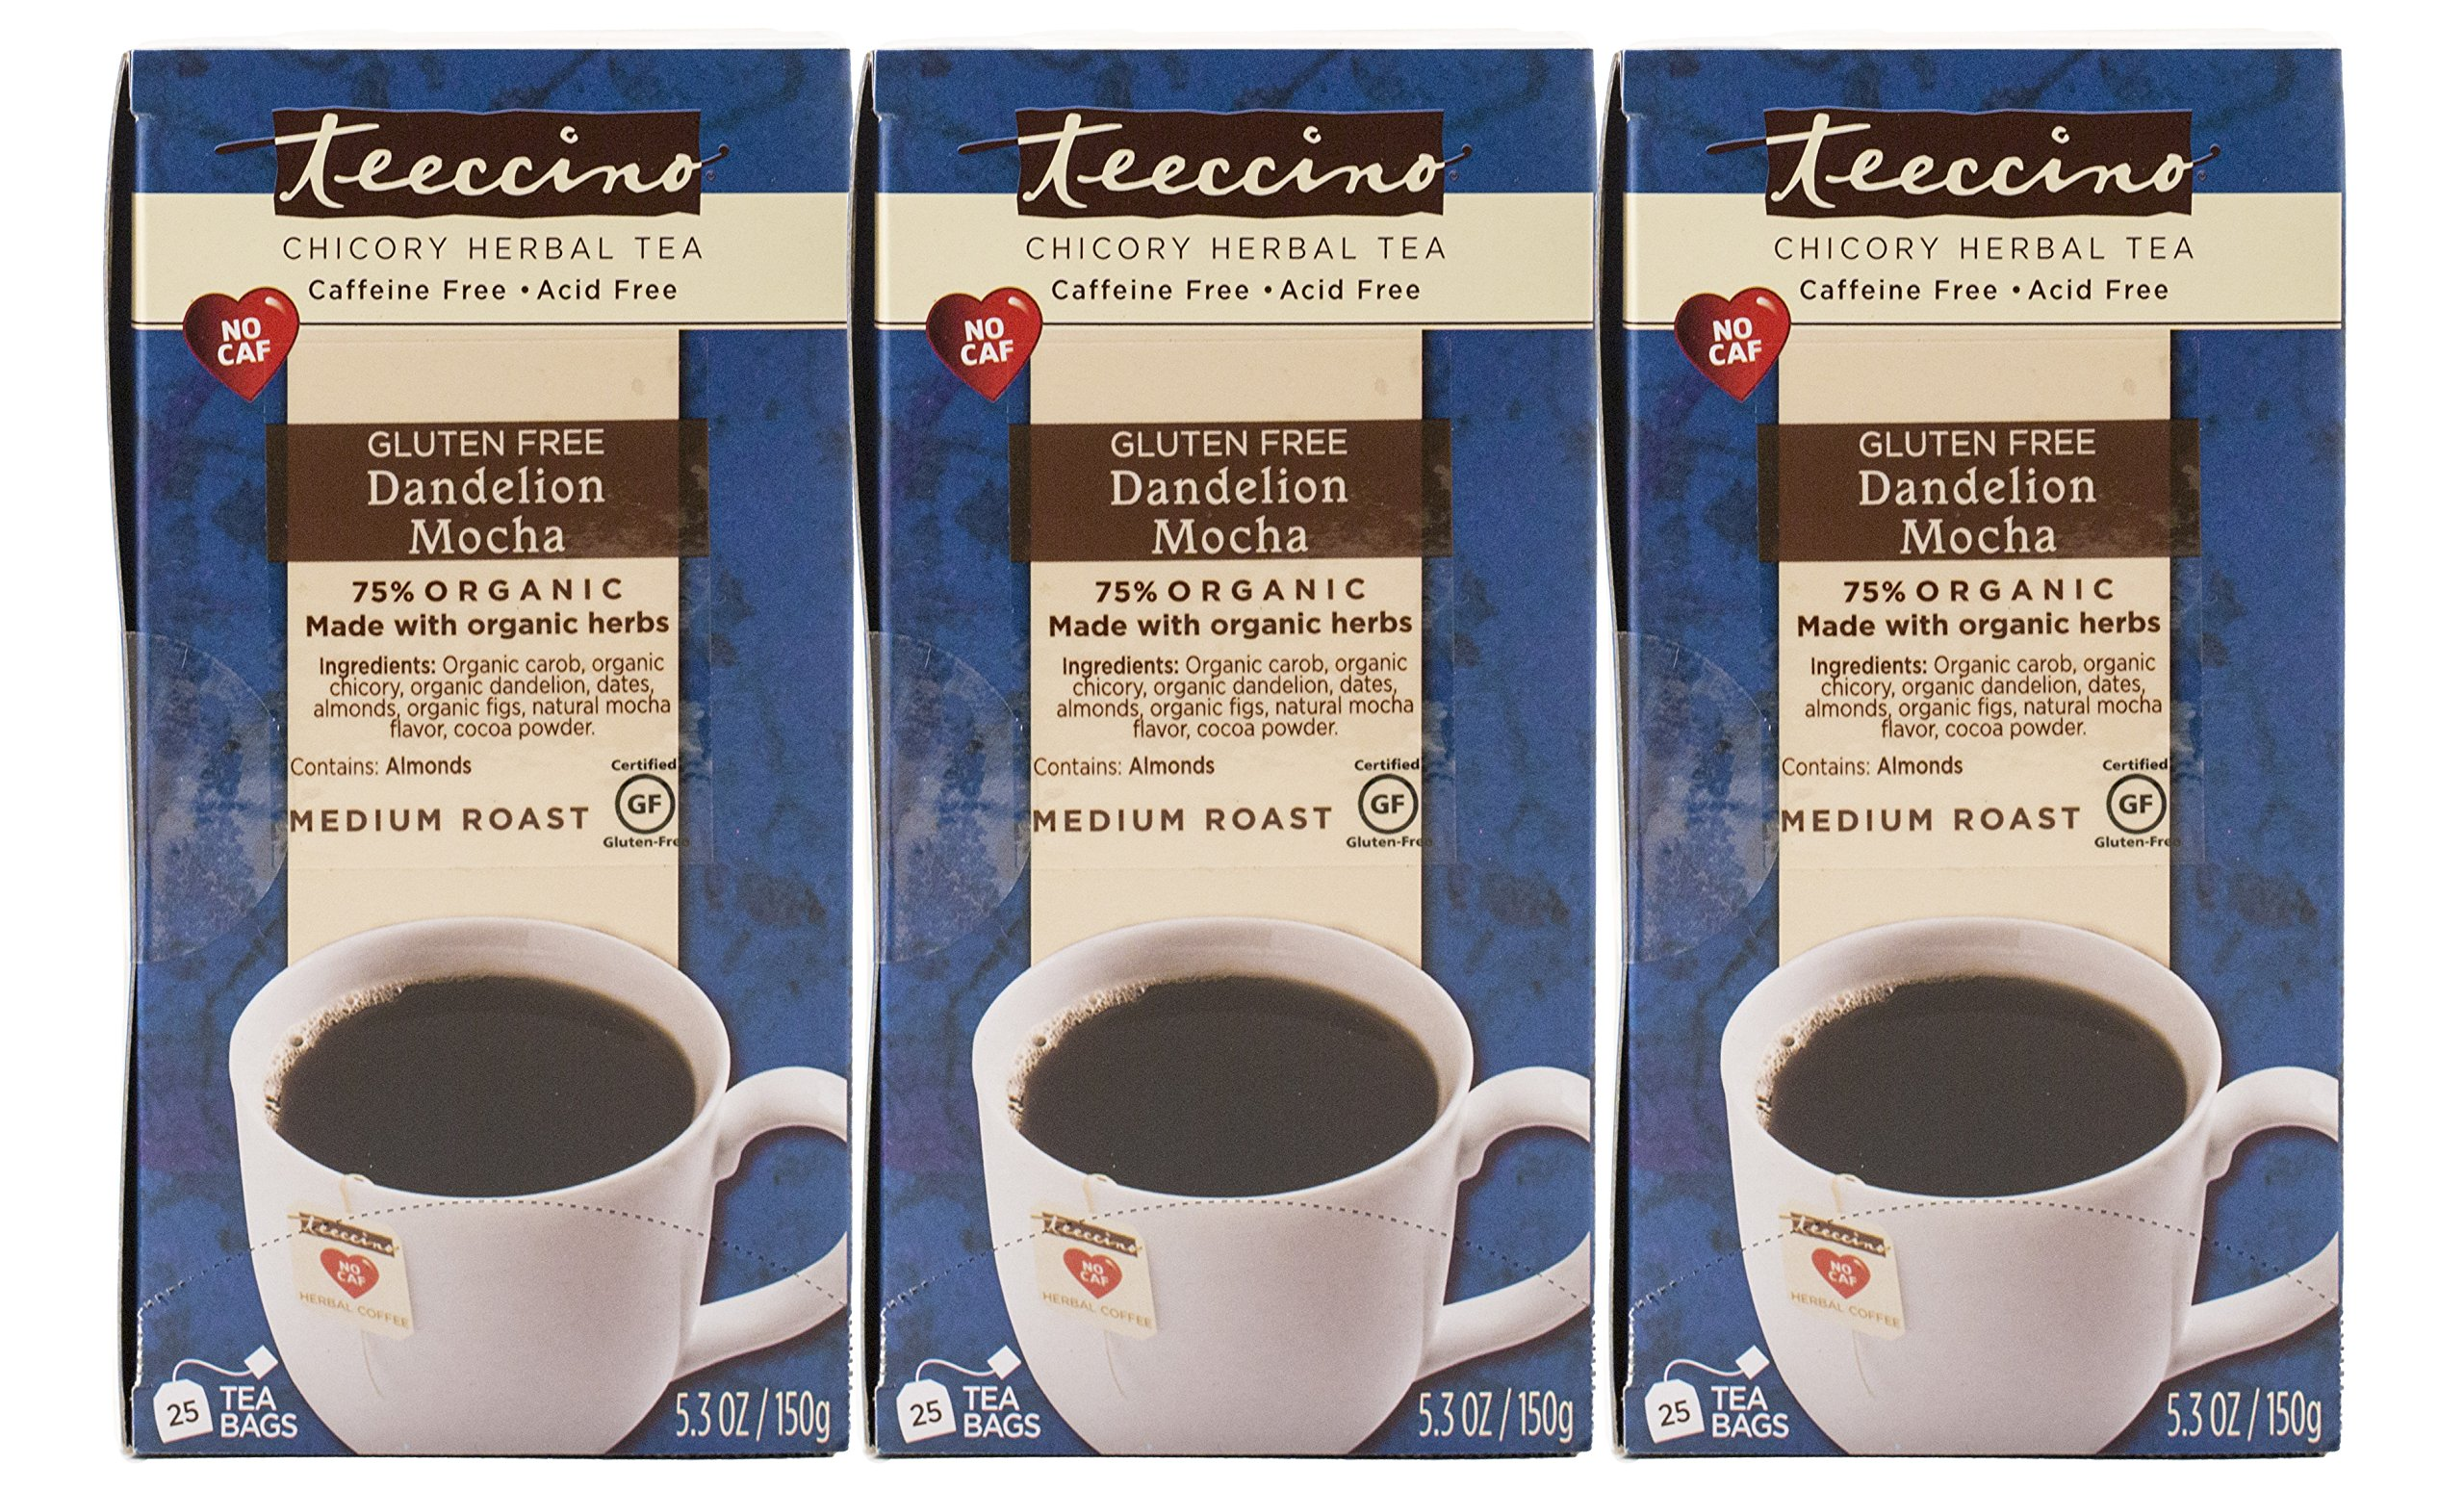 recipe: caffeine in tea bag vs coffee [23]